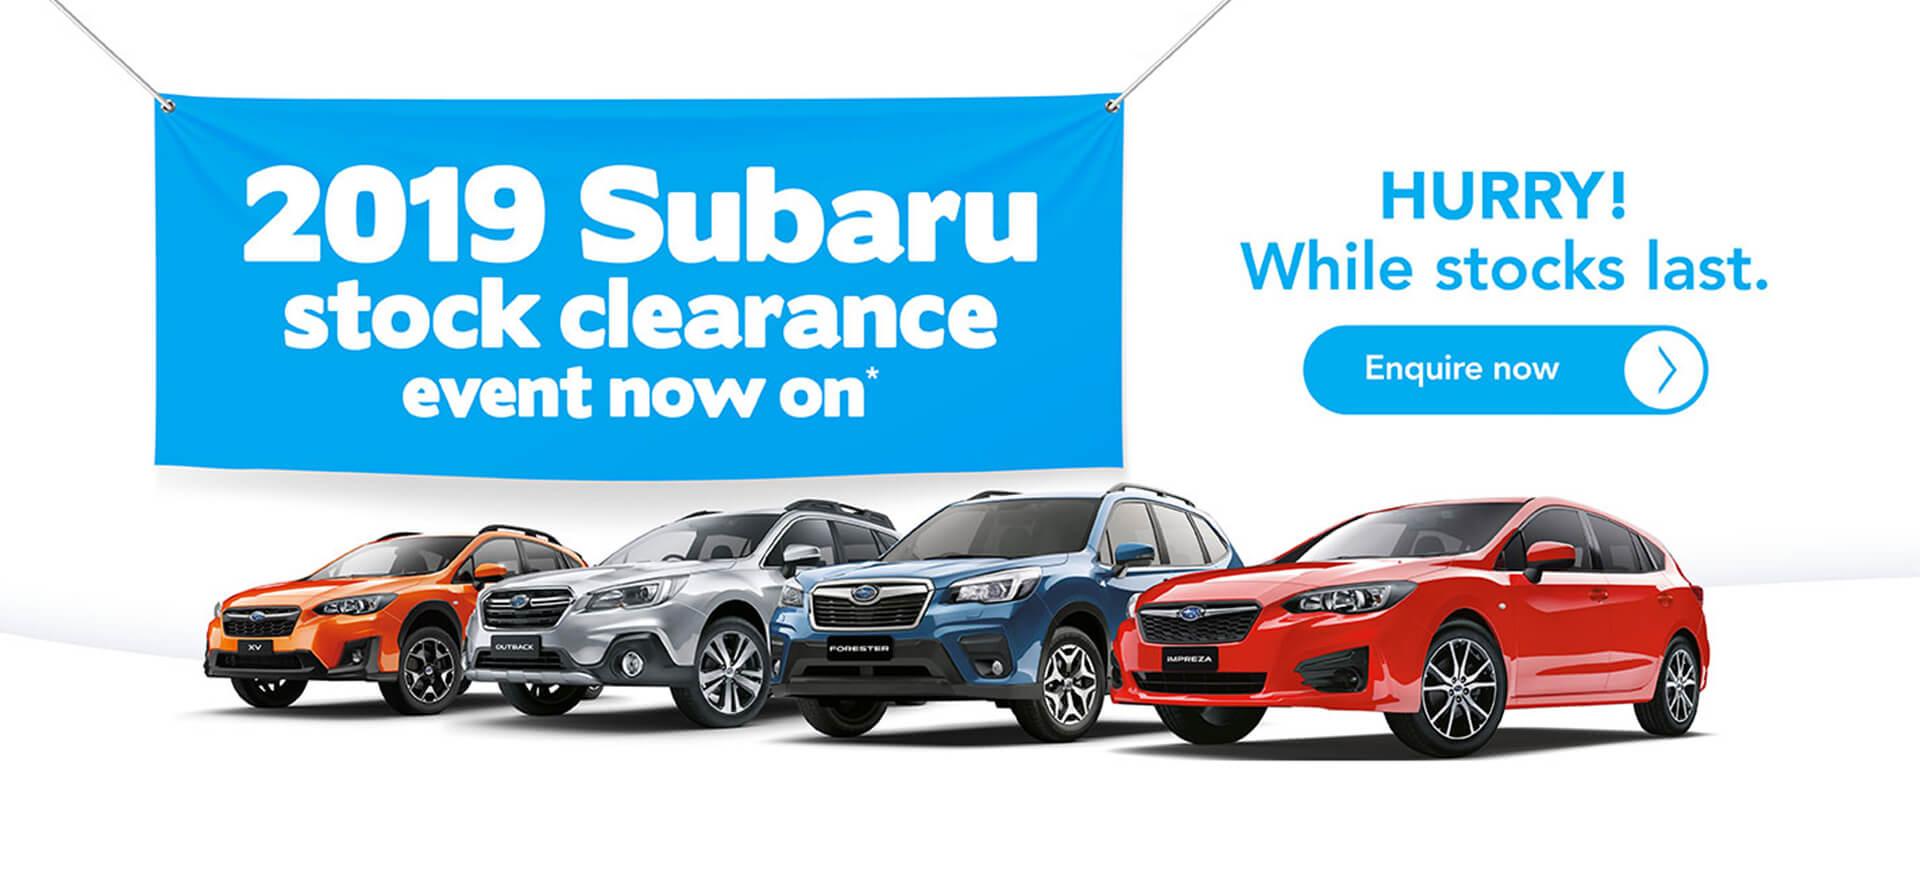 Reef City Motors Subaru Offers